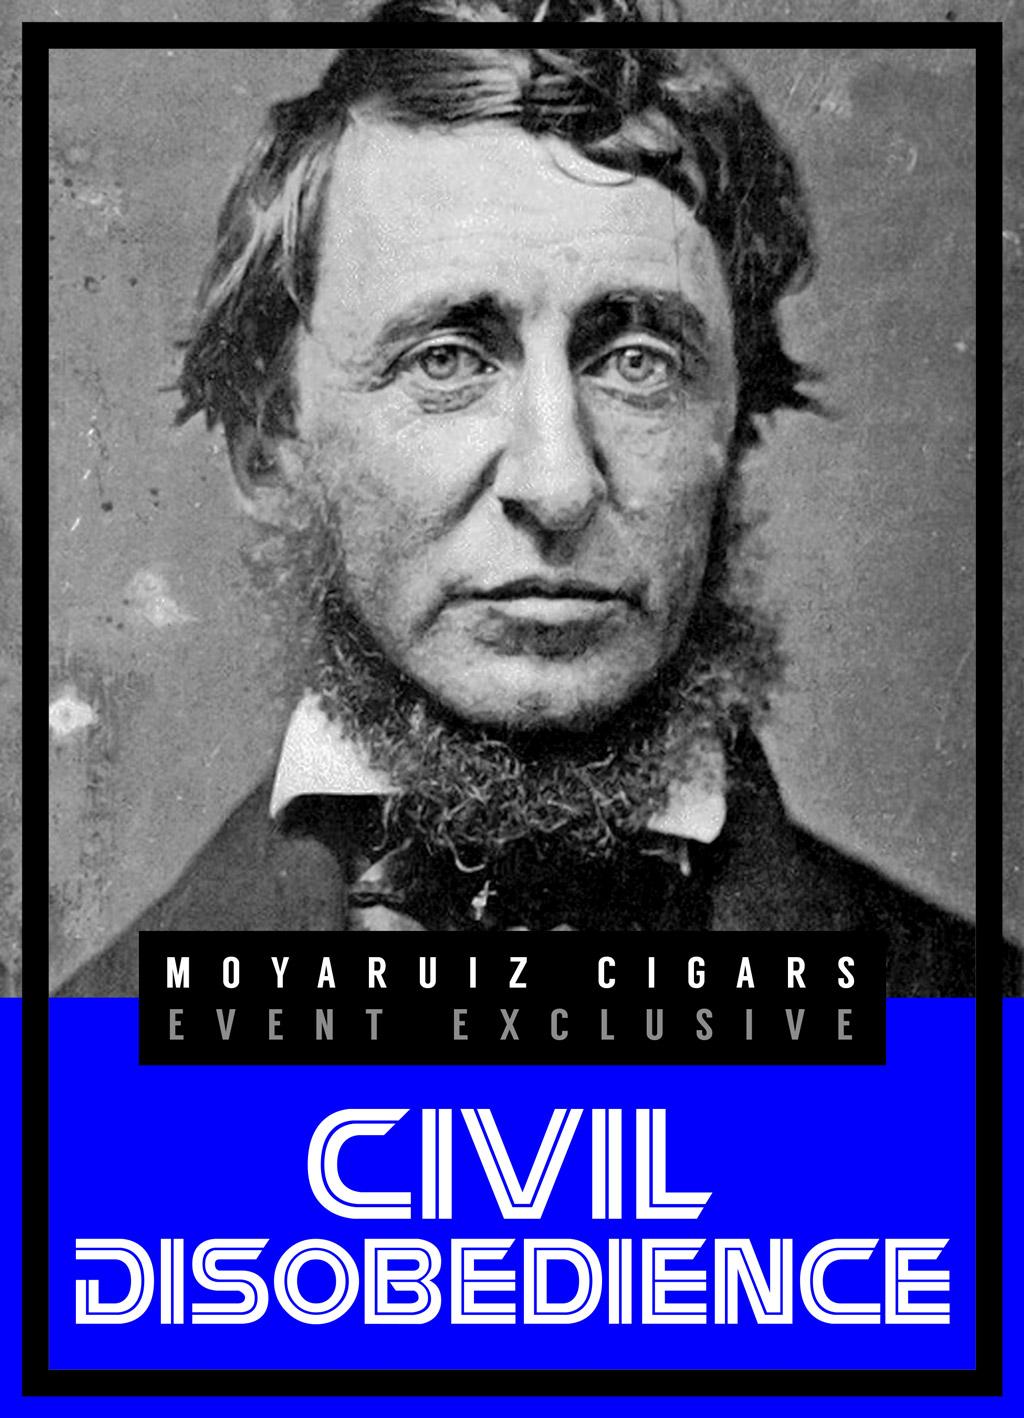 MoyaRuiz Civil Disobedience cigar artwork